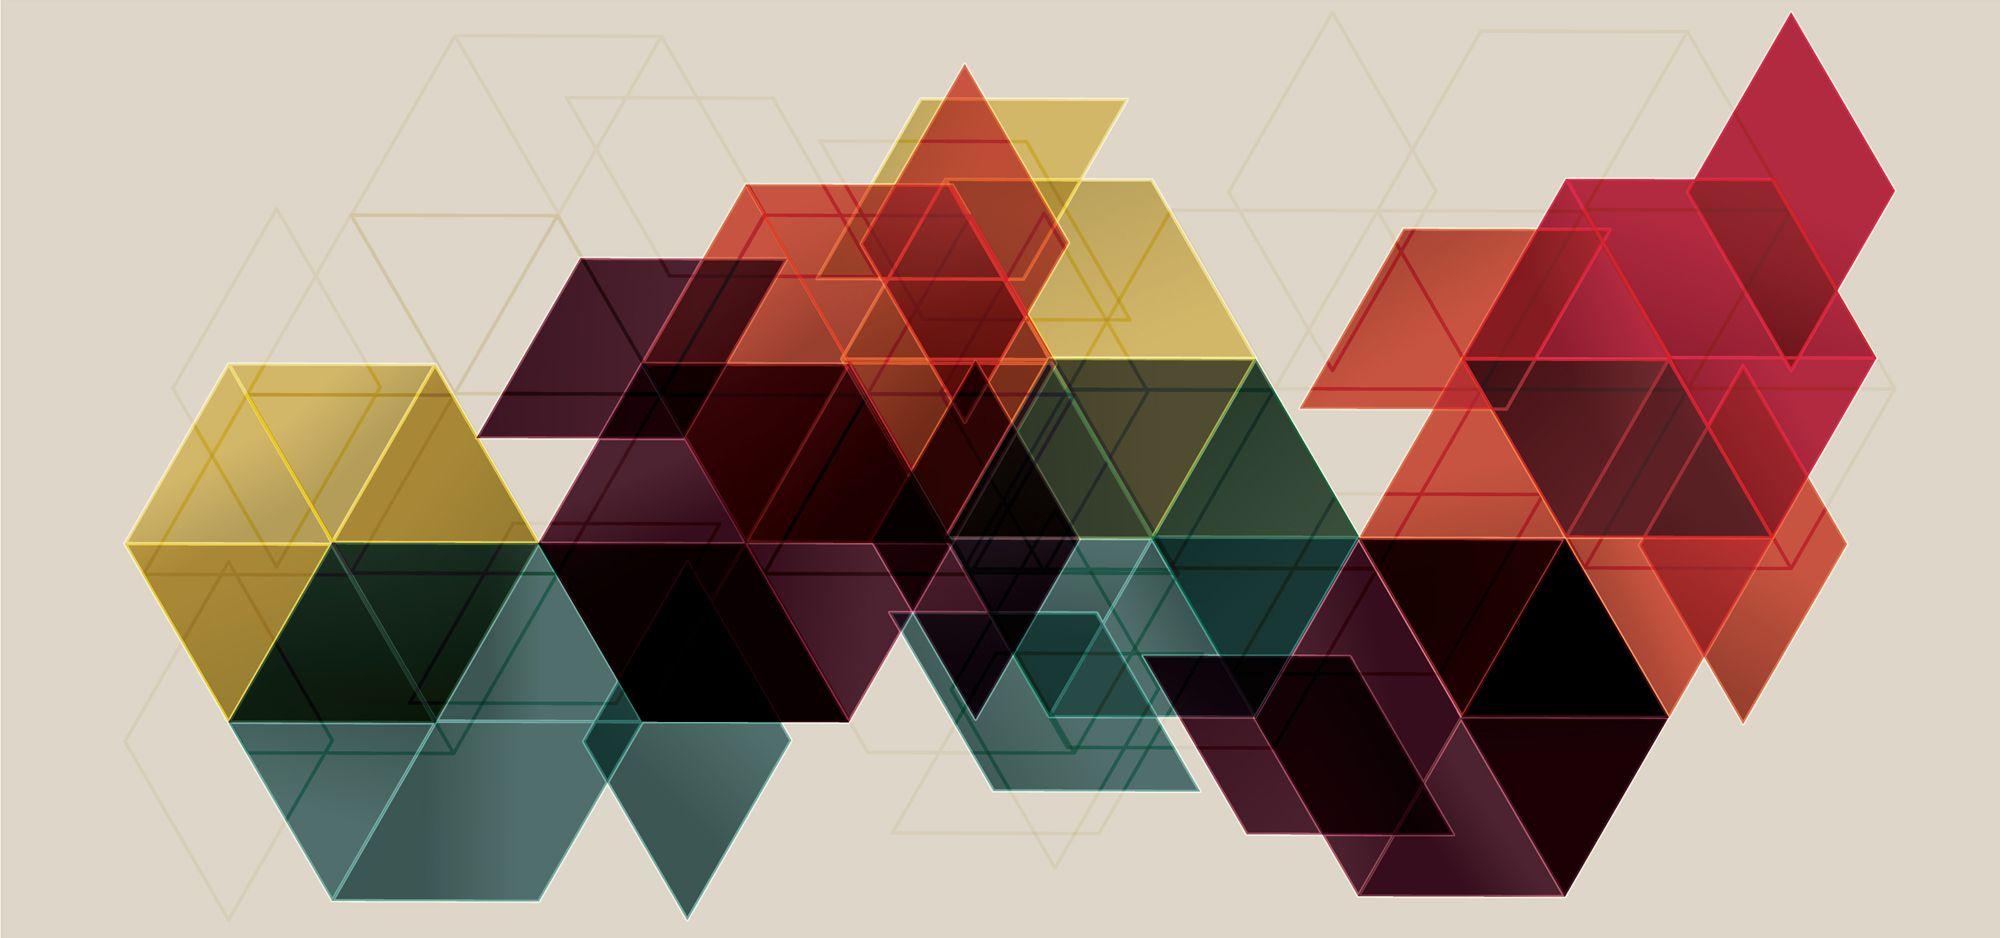 ombre geometric 3d wallpaper-#40